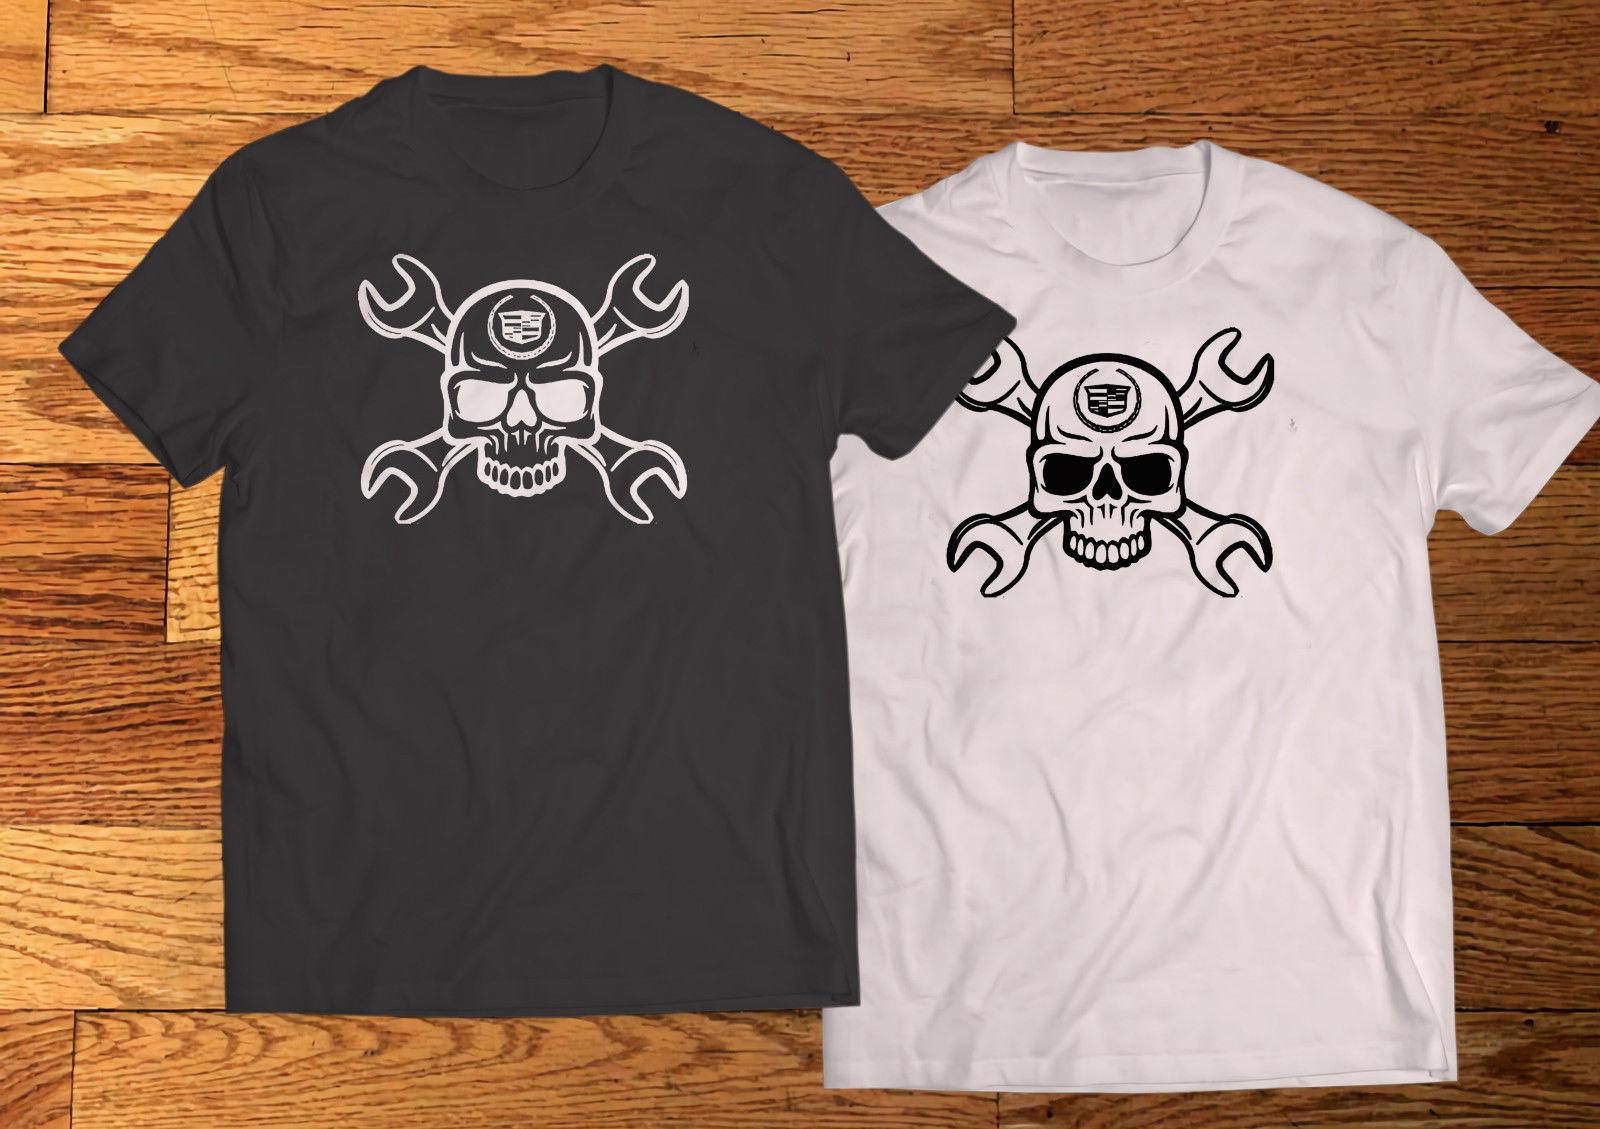 New Cadillac999Caddy SKULL JDM RacingED Black & White T-Shirt tee New Man Design T-Shirt Print